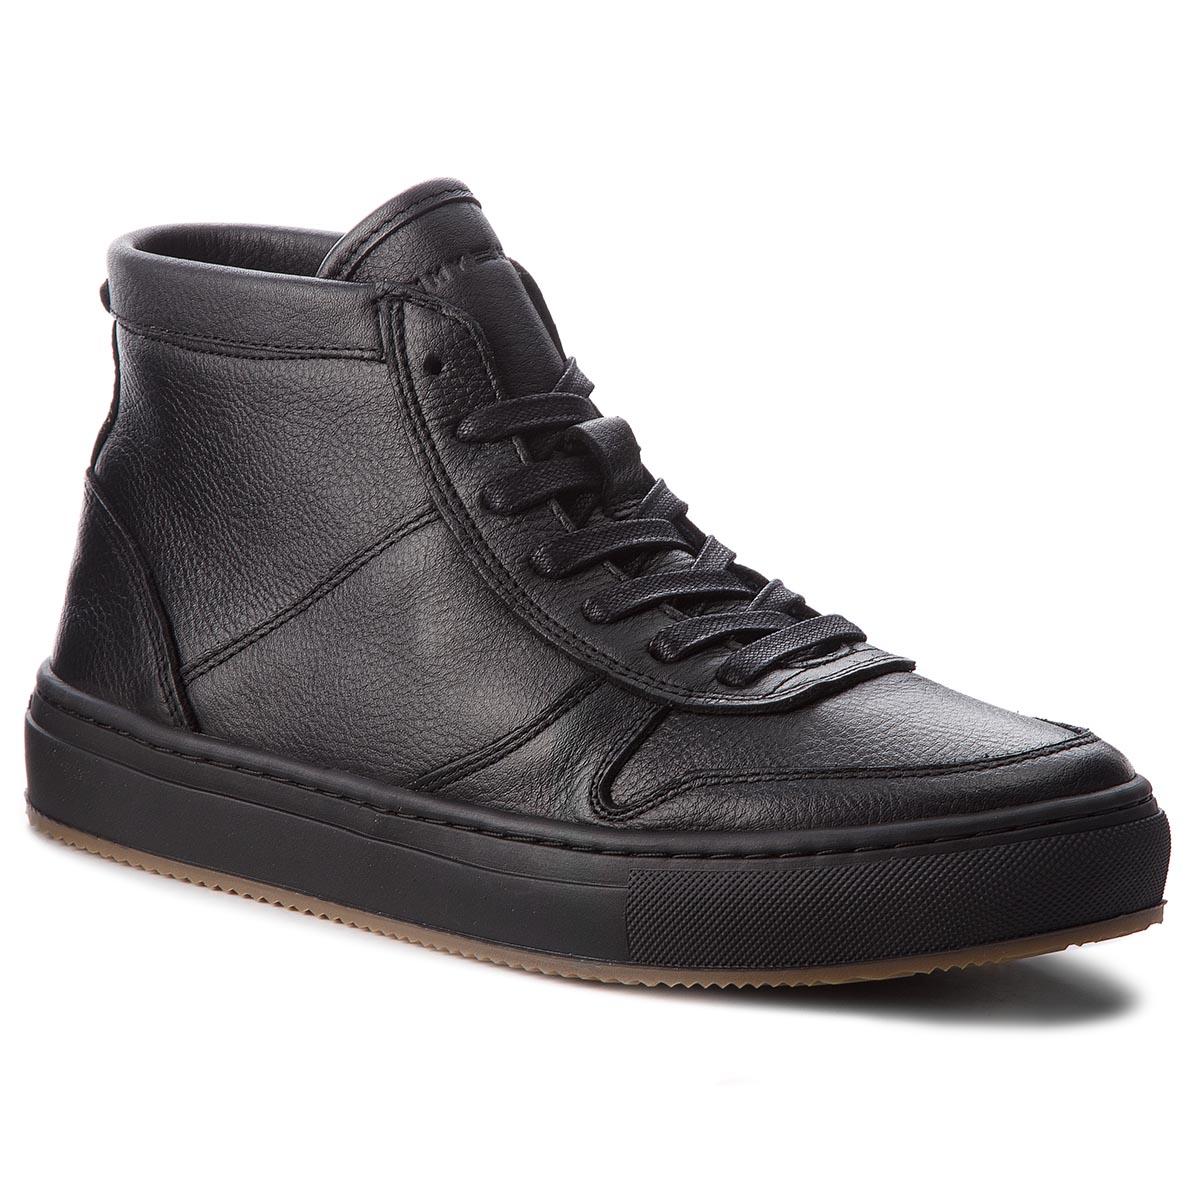 Bokacipő TOMMY HILFIGER - Pebbled Leather MId FM0FM01683 Black 990 ... 19424a14b2